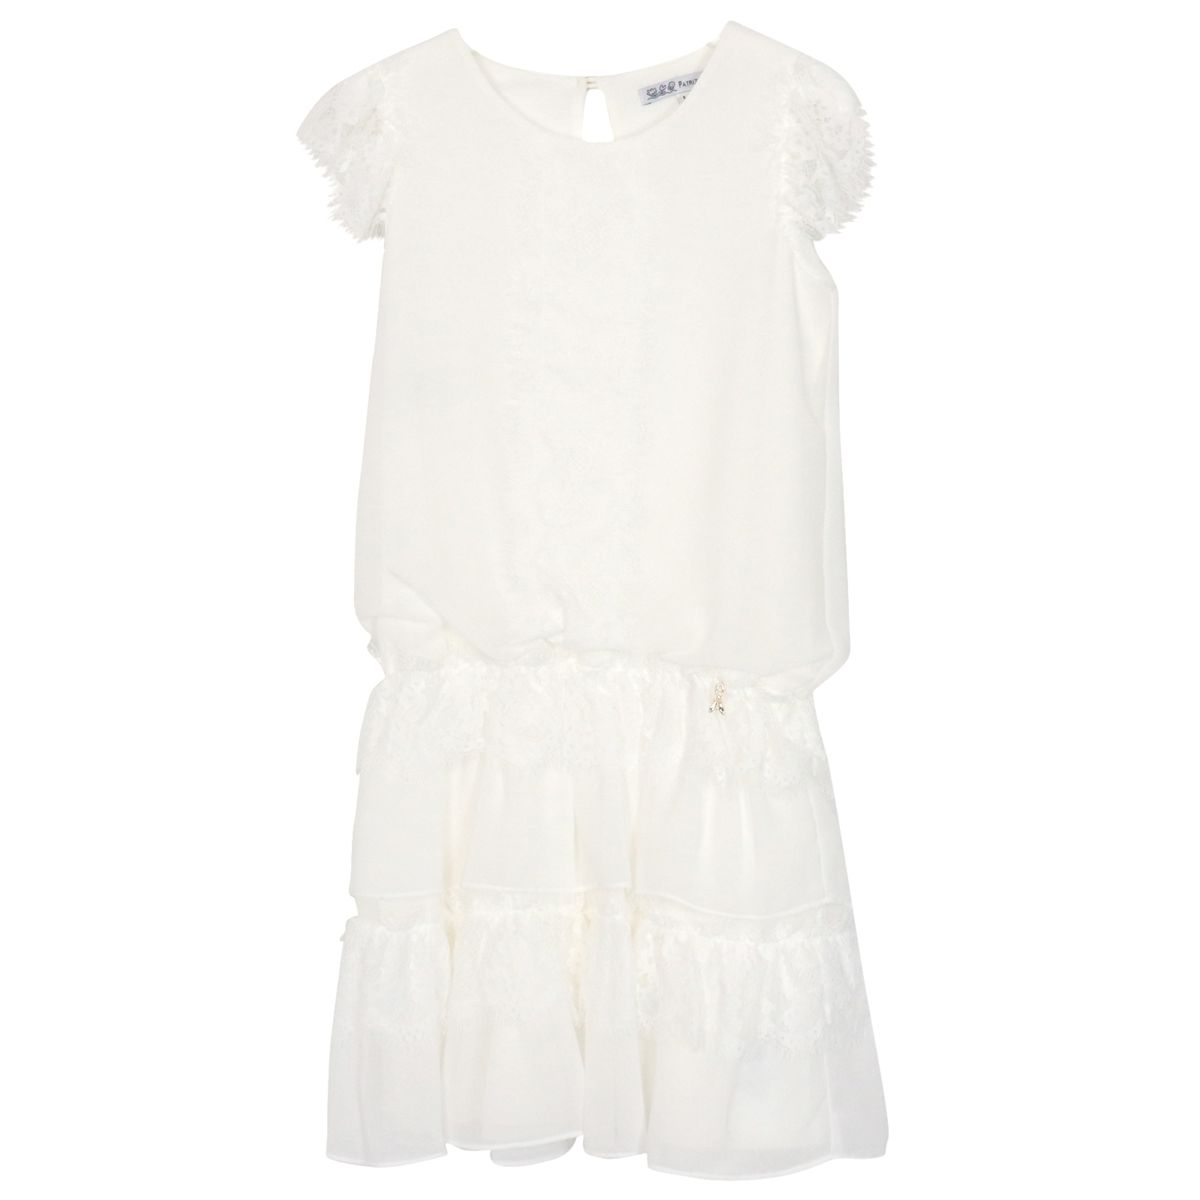 Viscose dress with lace inserts Cream Patrizia Pepe